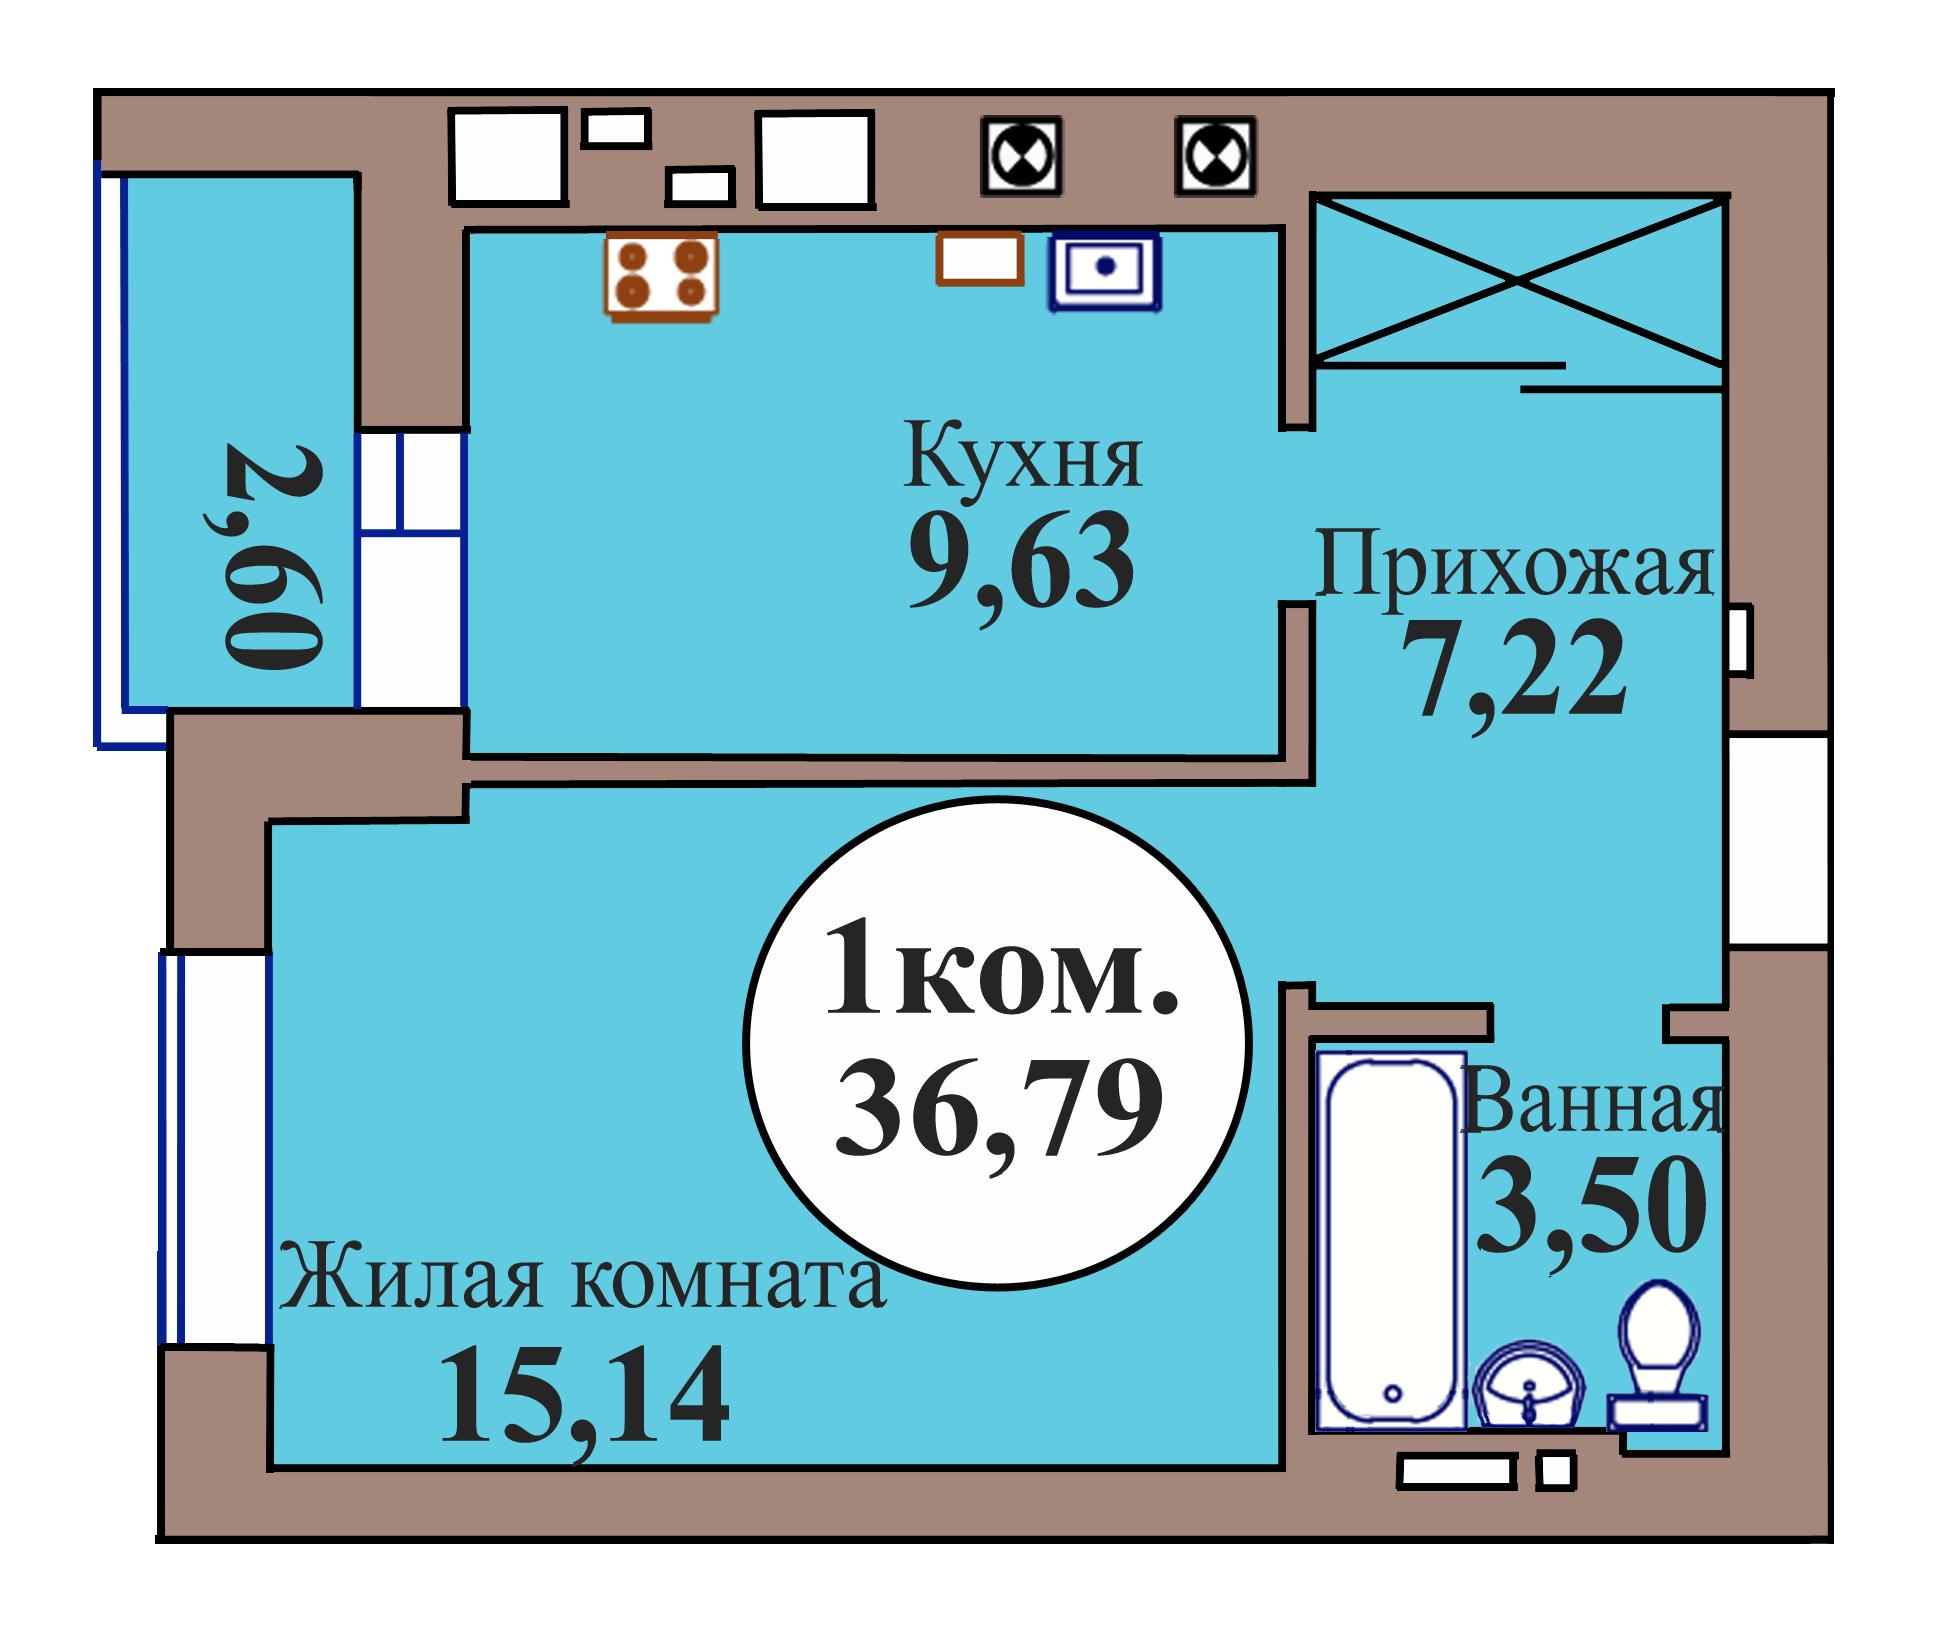 1-комн. кв. по пер. Калининградский, 5 кв. 84 в Калининграде